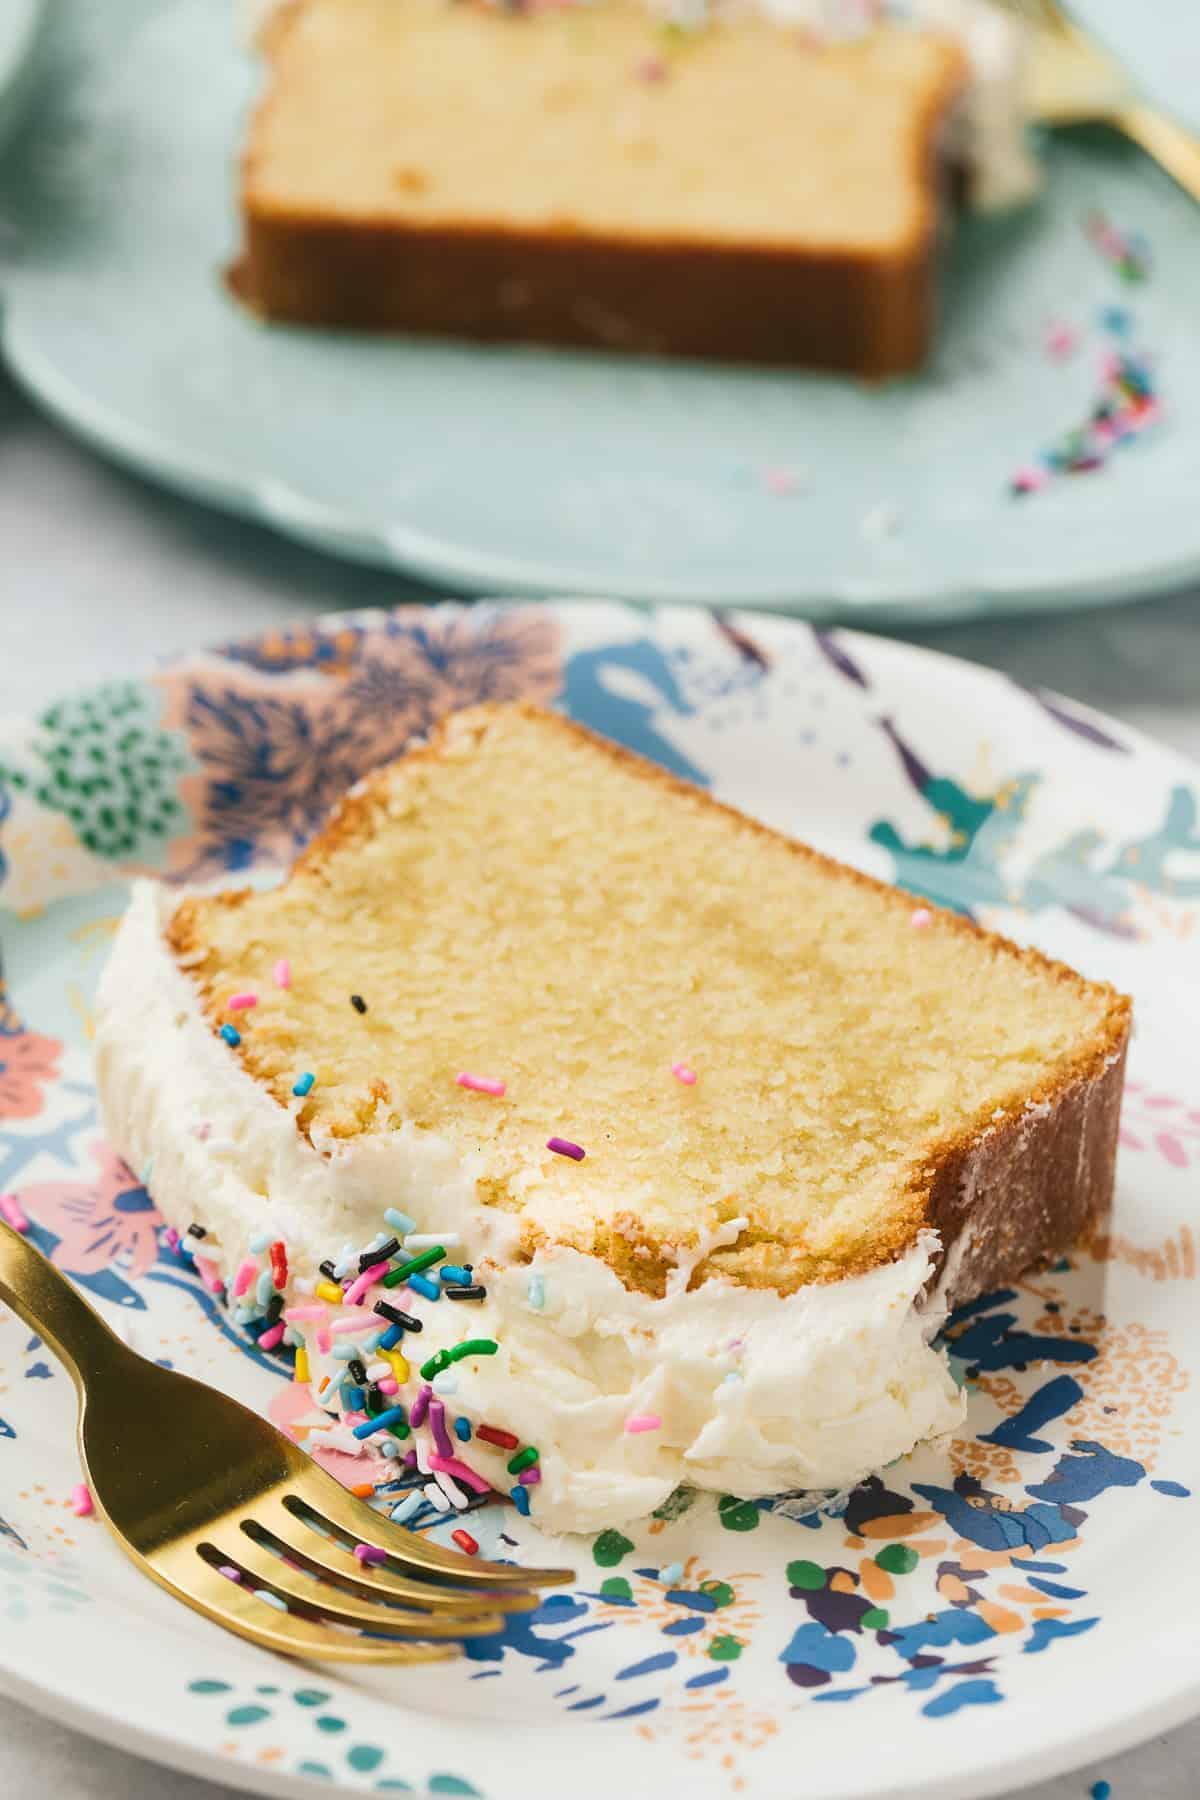 A slice of sponge cake on a patterned plate.